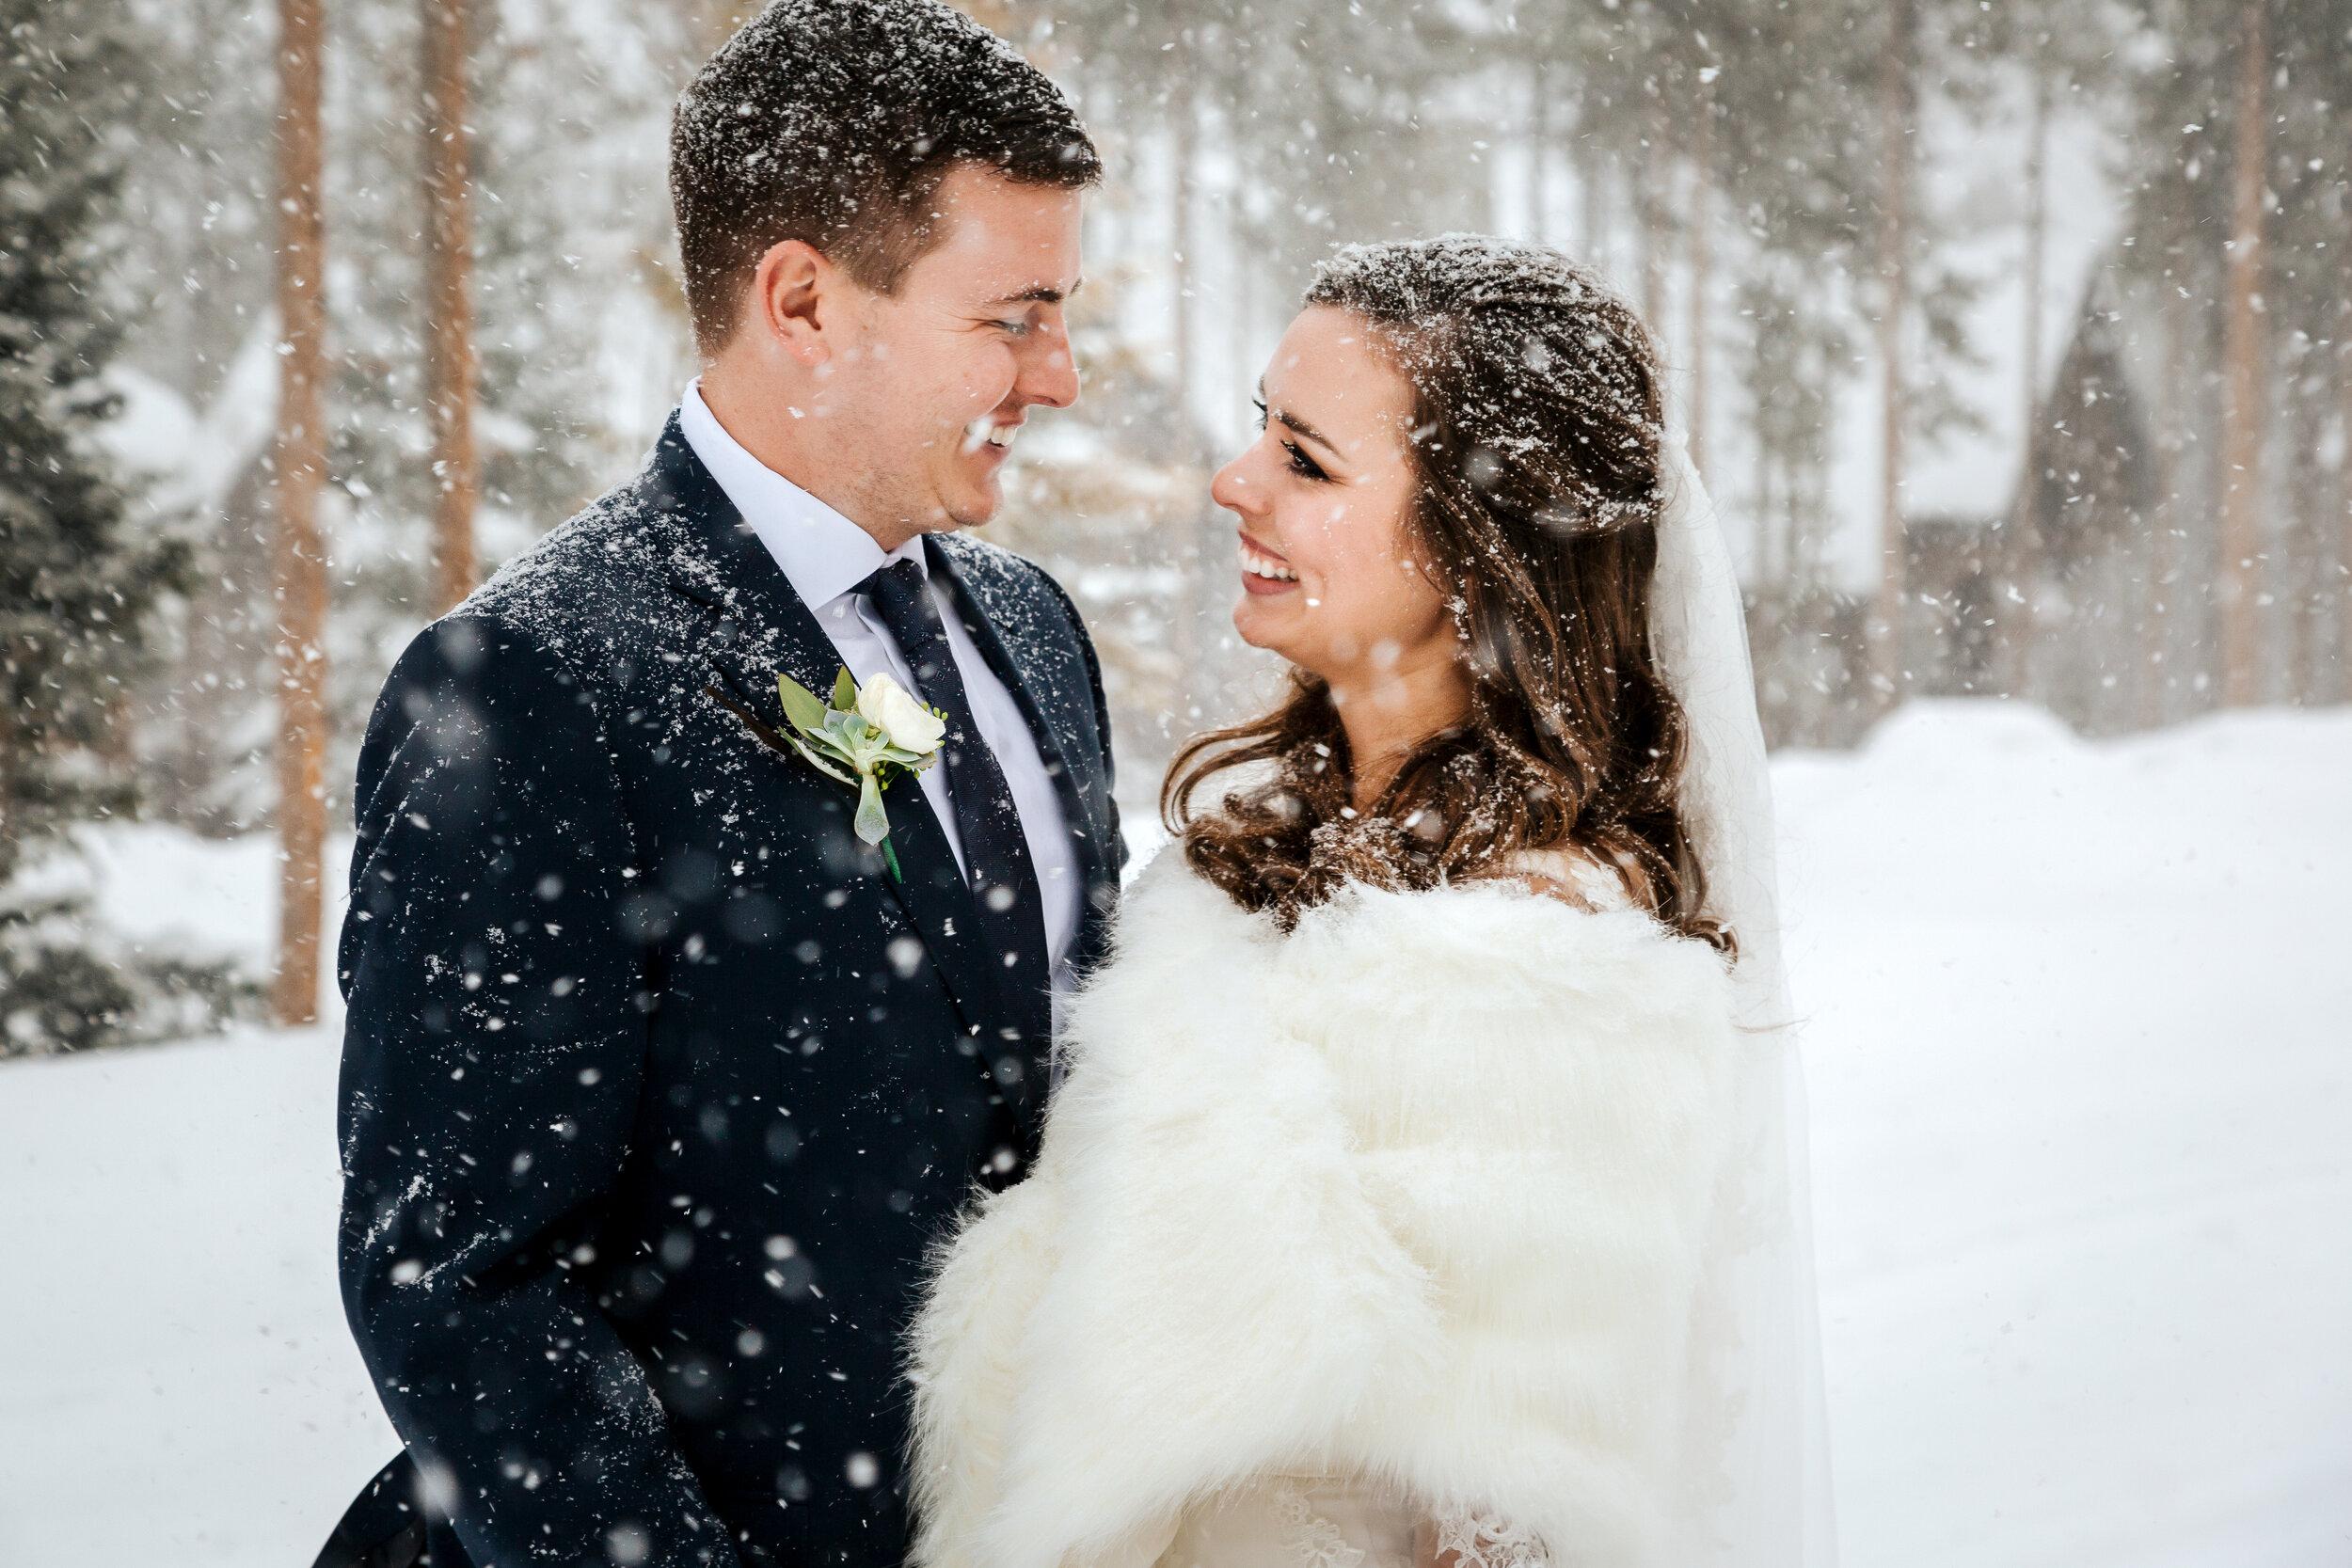 A Cozy Winter Fireside Breckenridge Colorado Elopement for Aaron and Cody